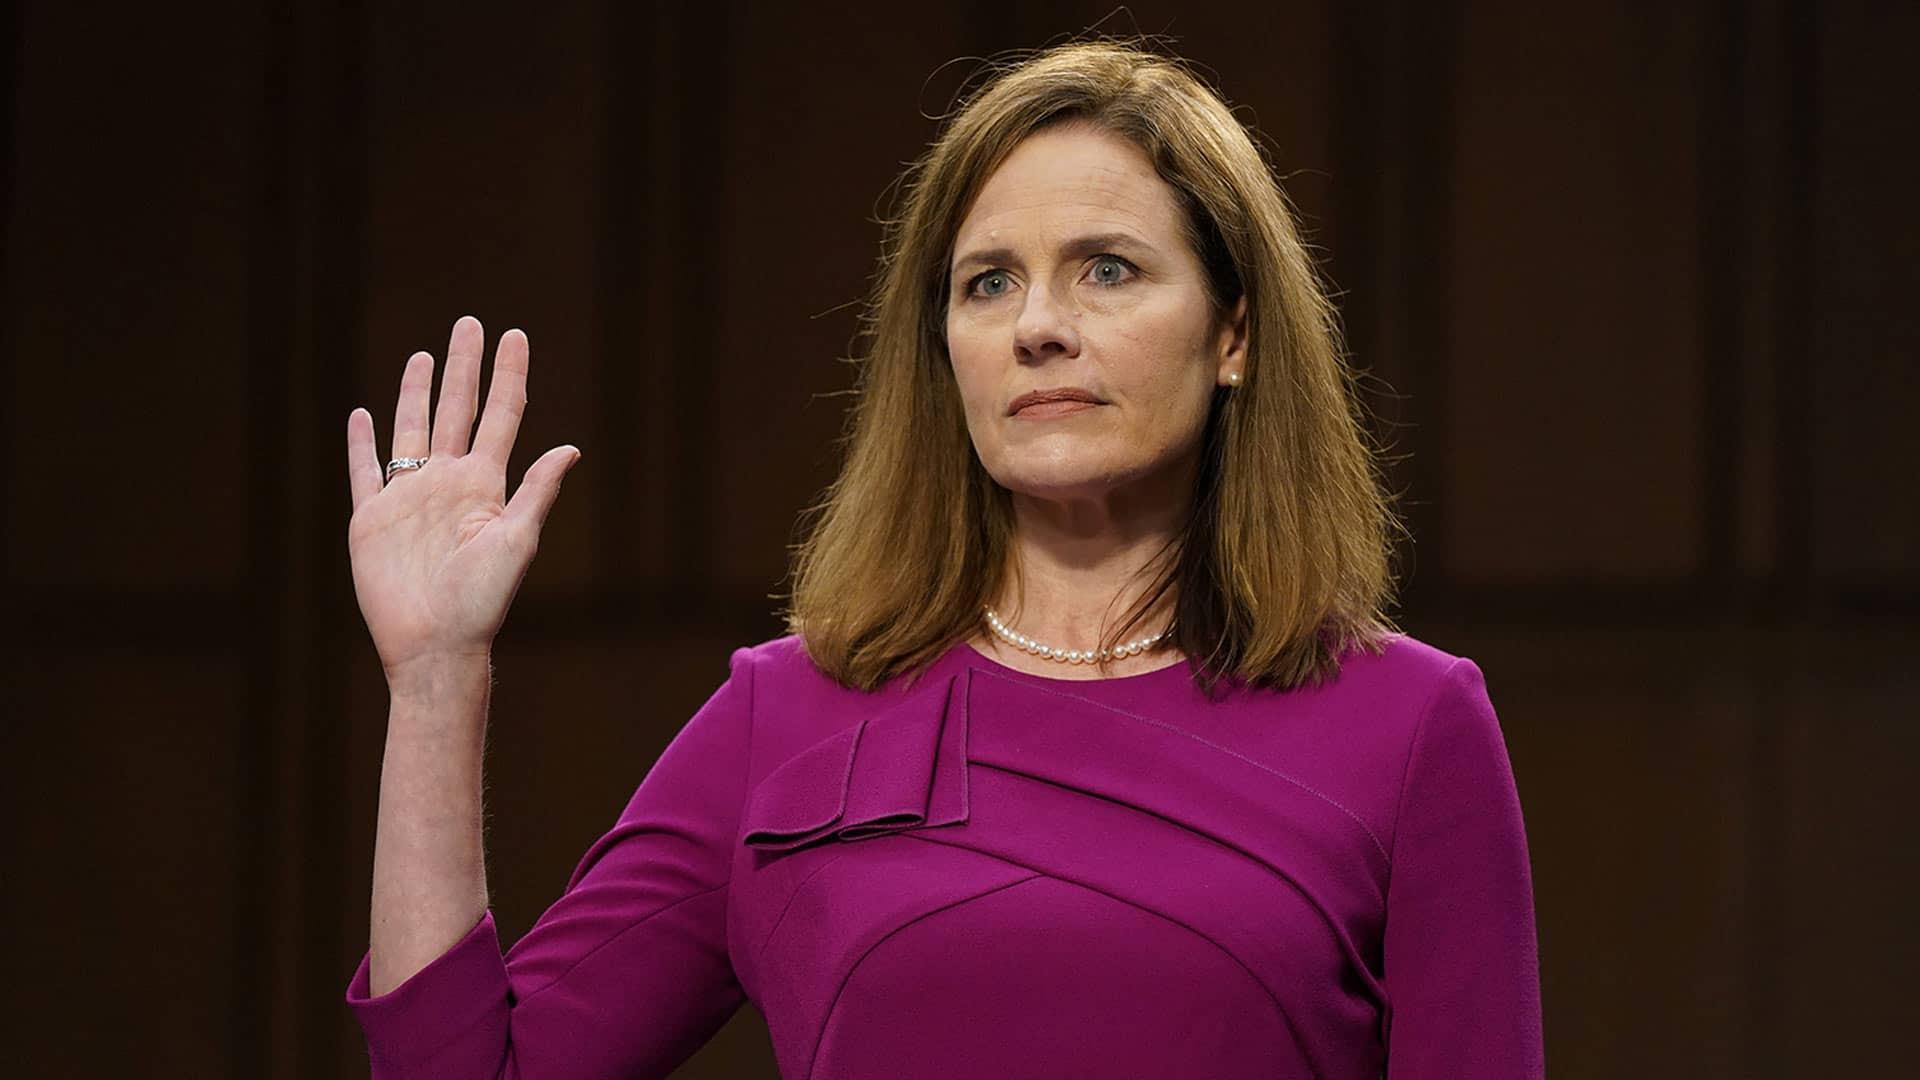 Senators clash in opening of Barrett confirmation hearing